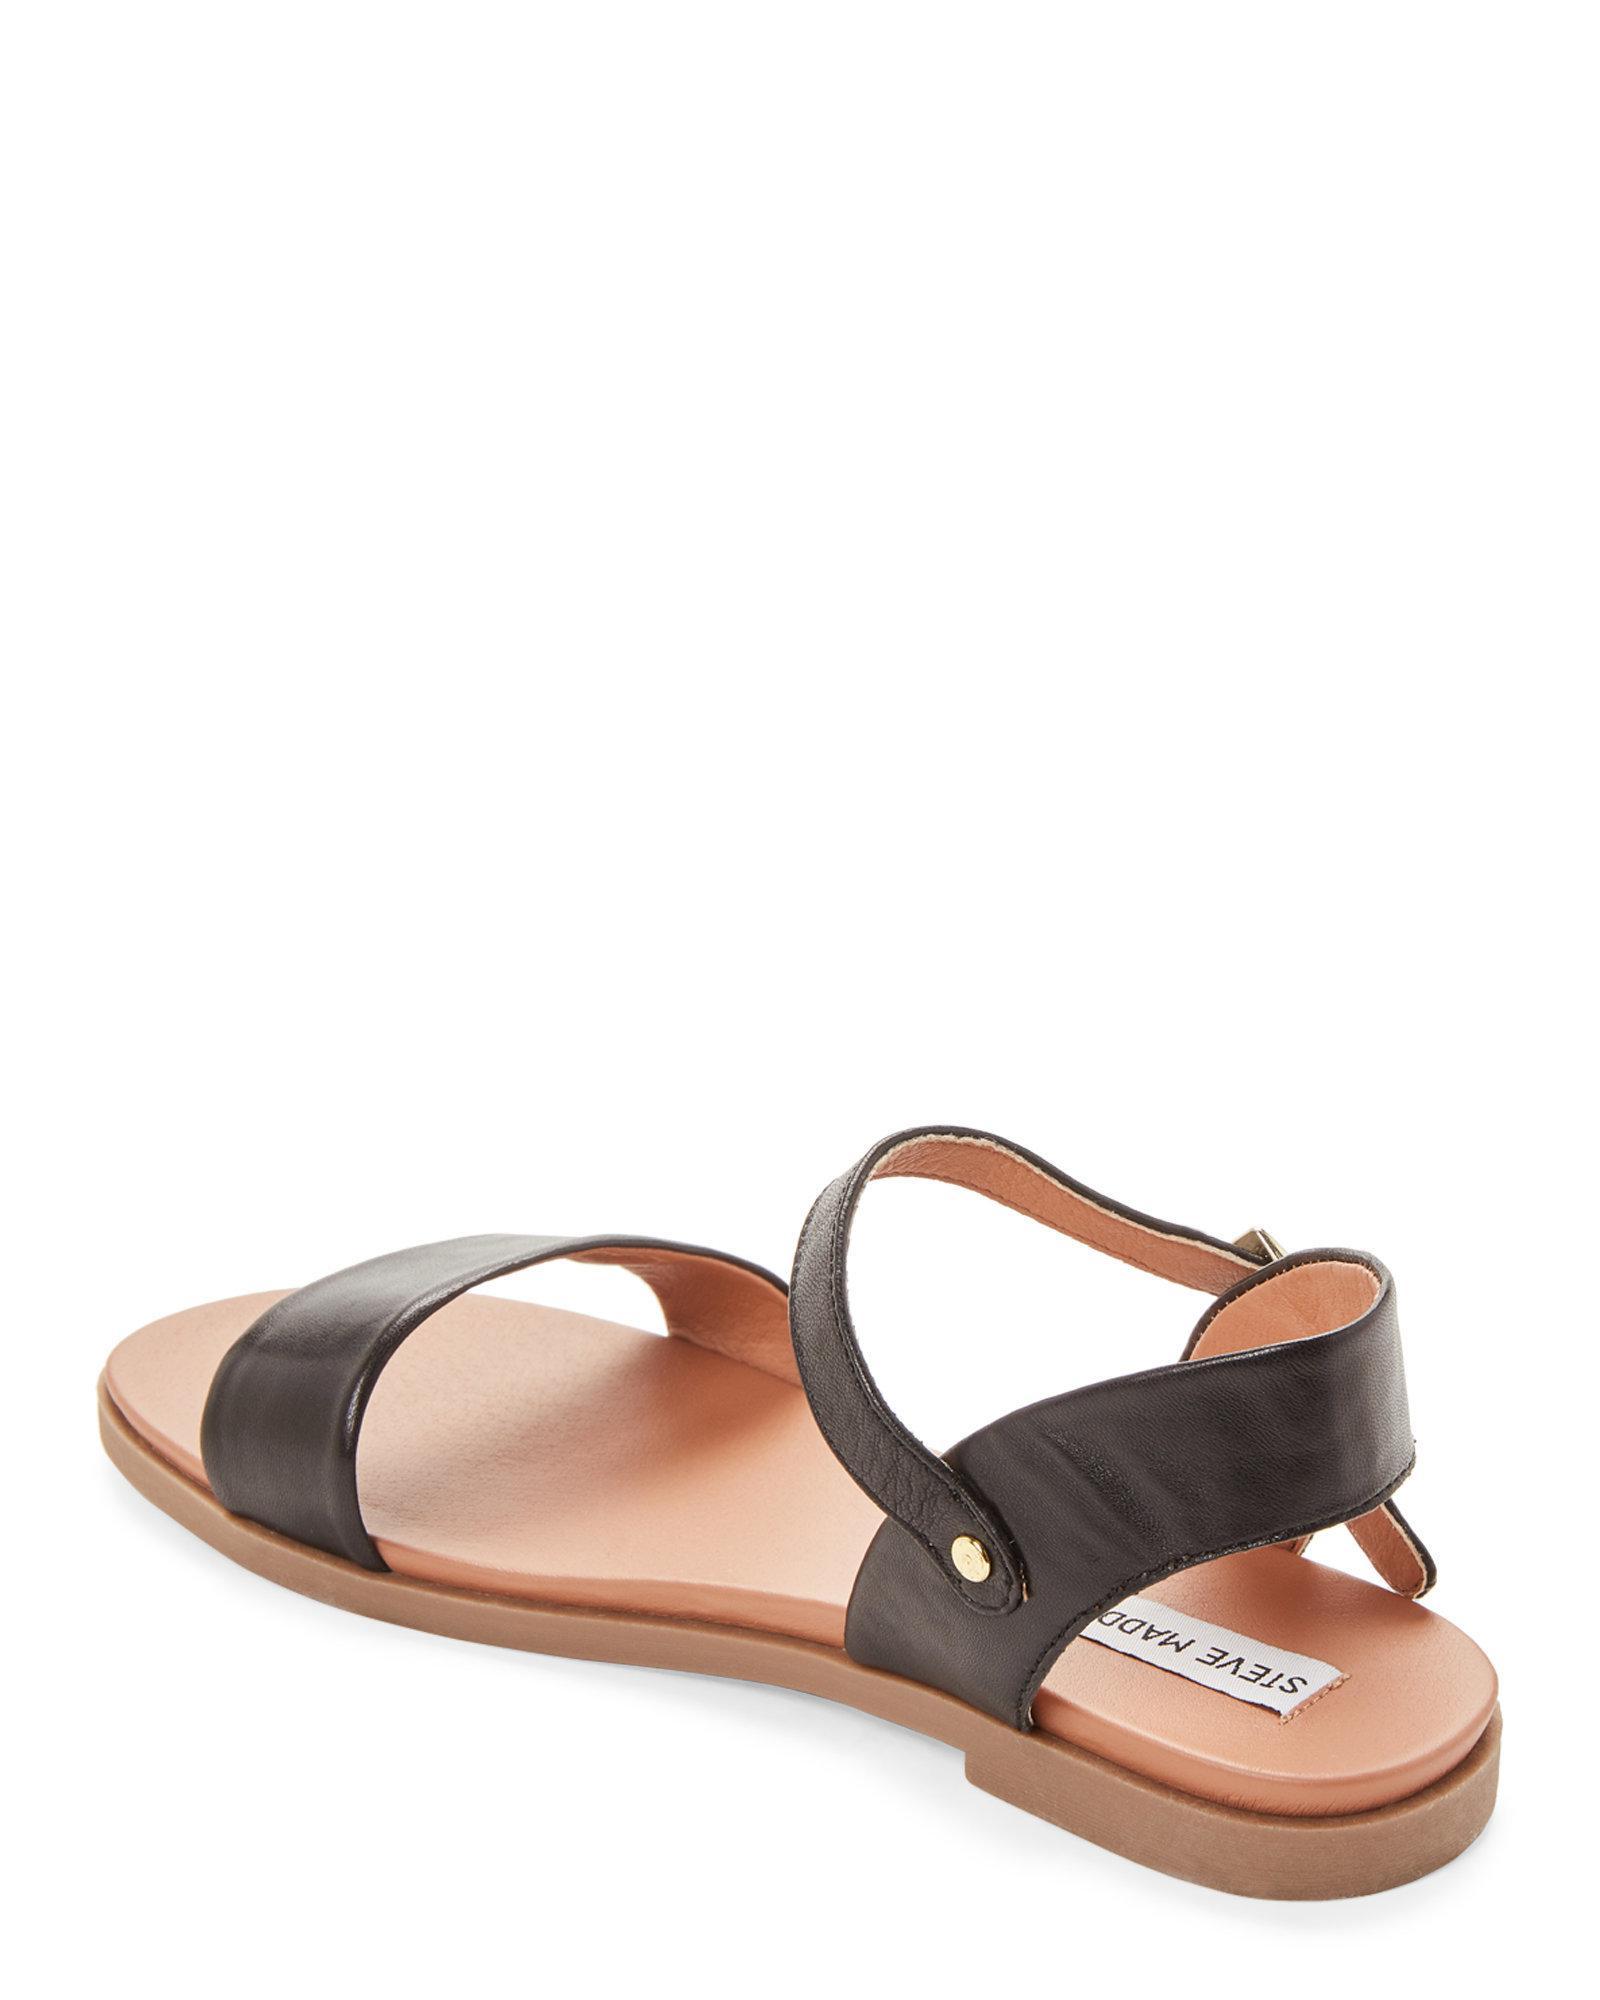 fb4e1eec52e1 Steve Madden - Black Dina Leather Flat Sandals - Lyst. View fullscreen